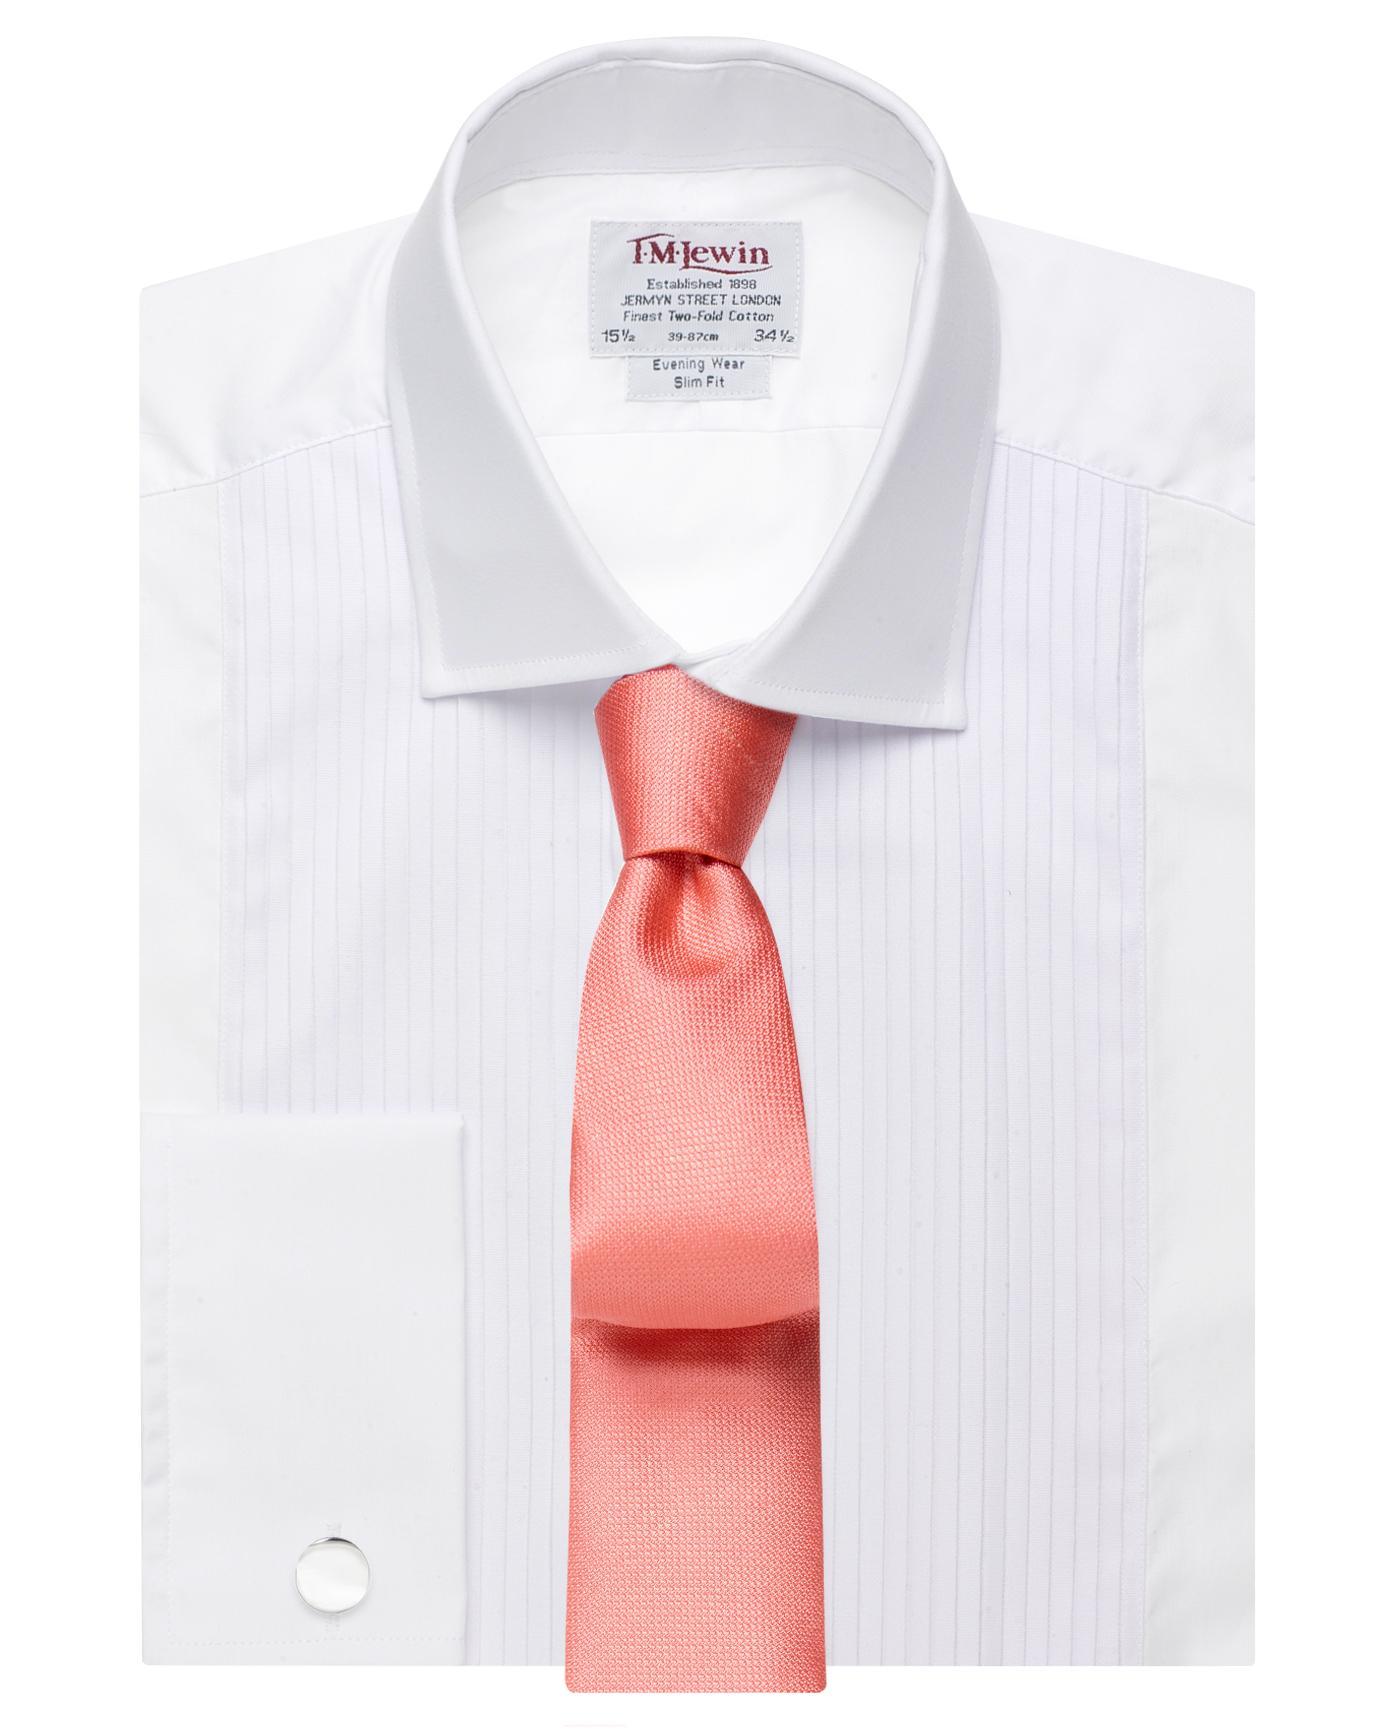 Pleated Slim Fit Evening Dress Shirt Reviews Tm Lewin Reviews Feefo